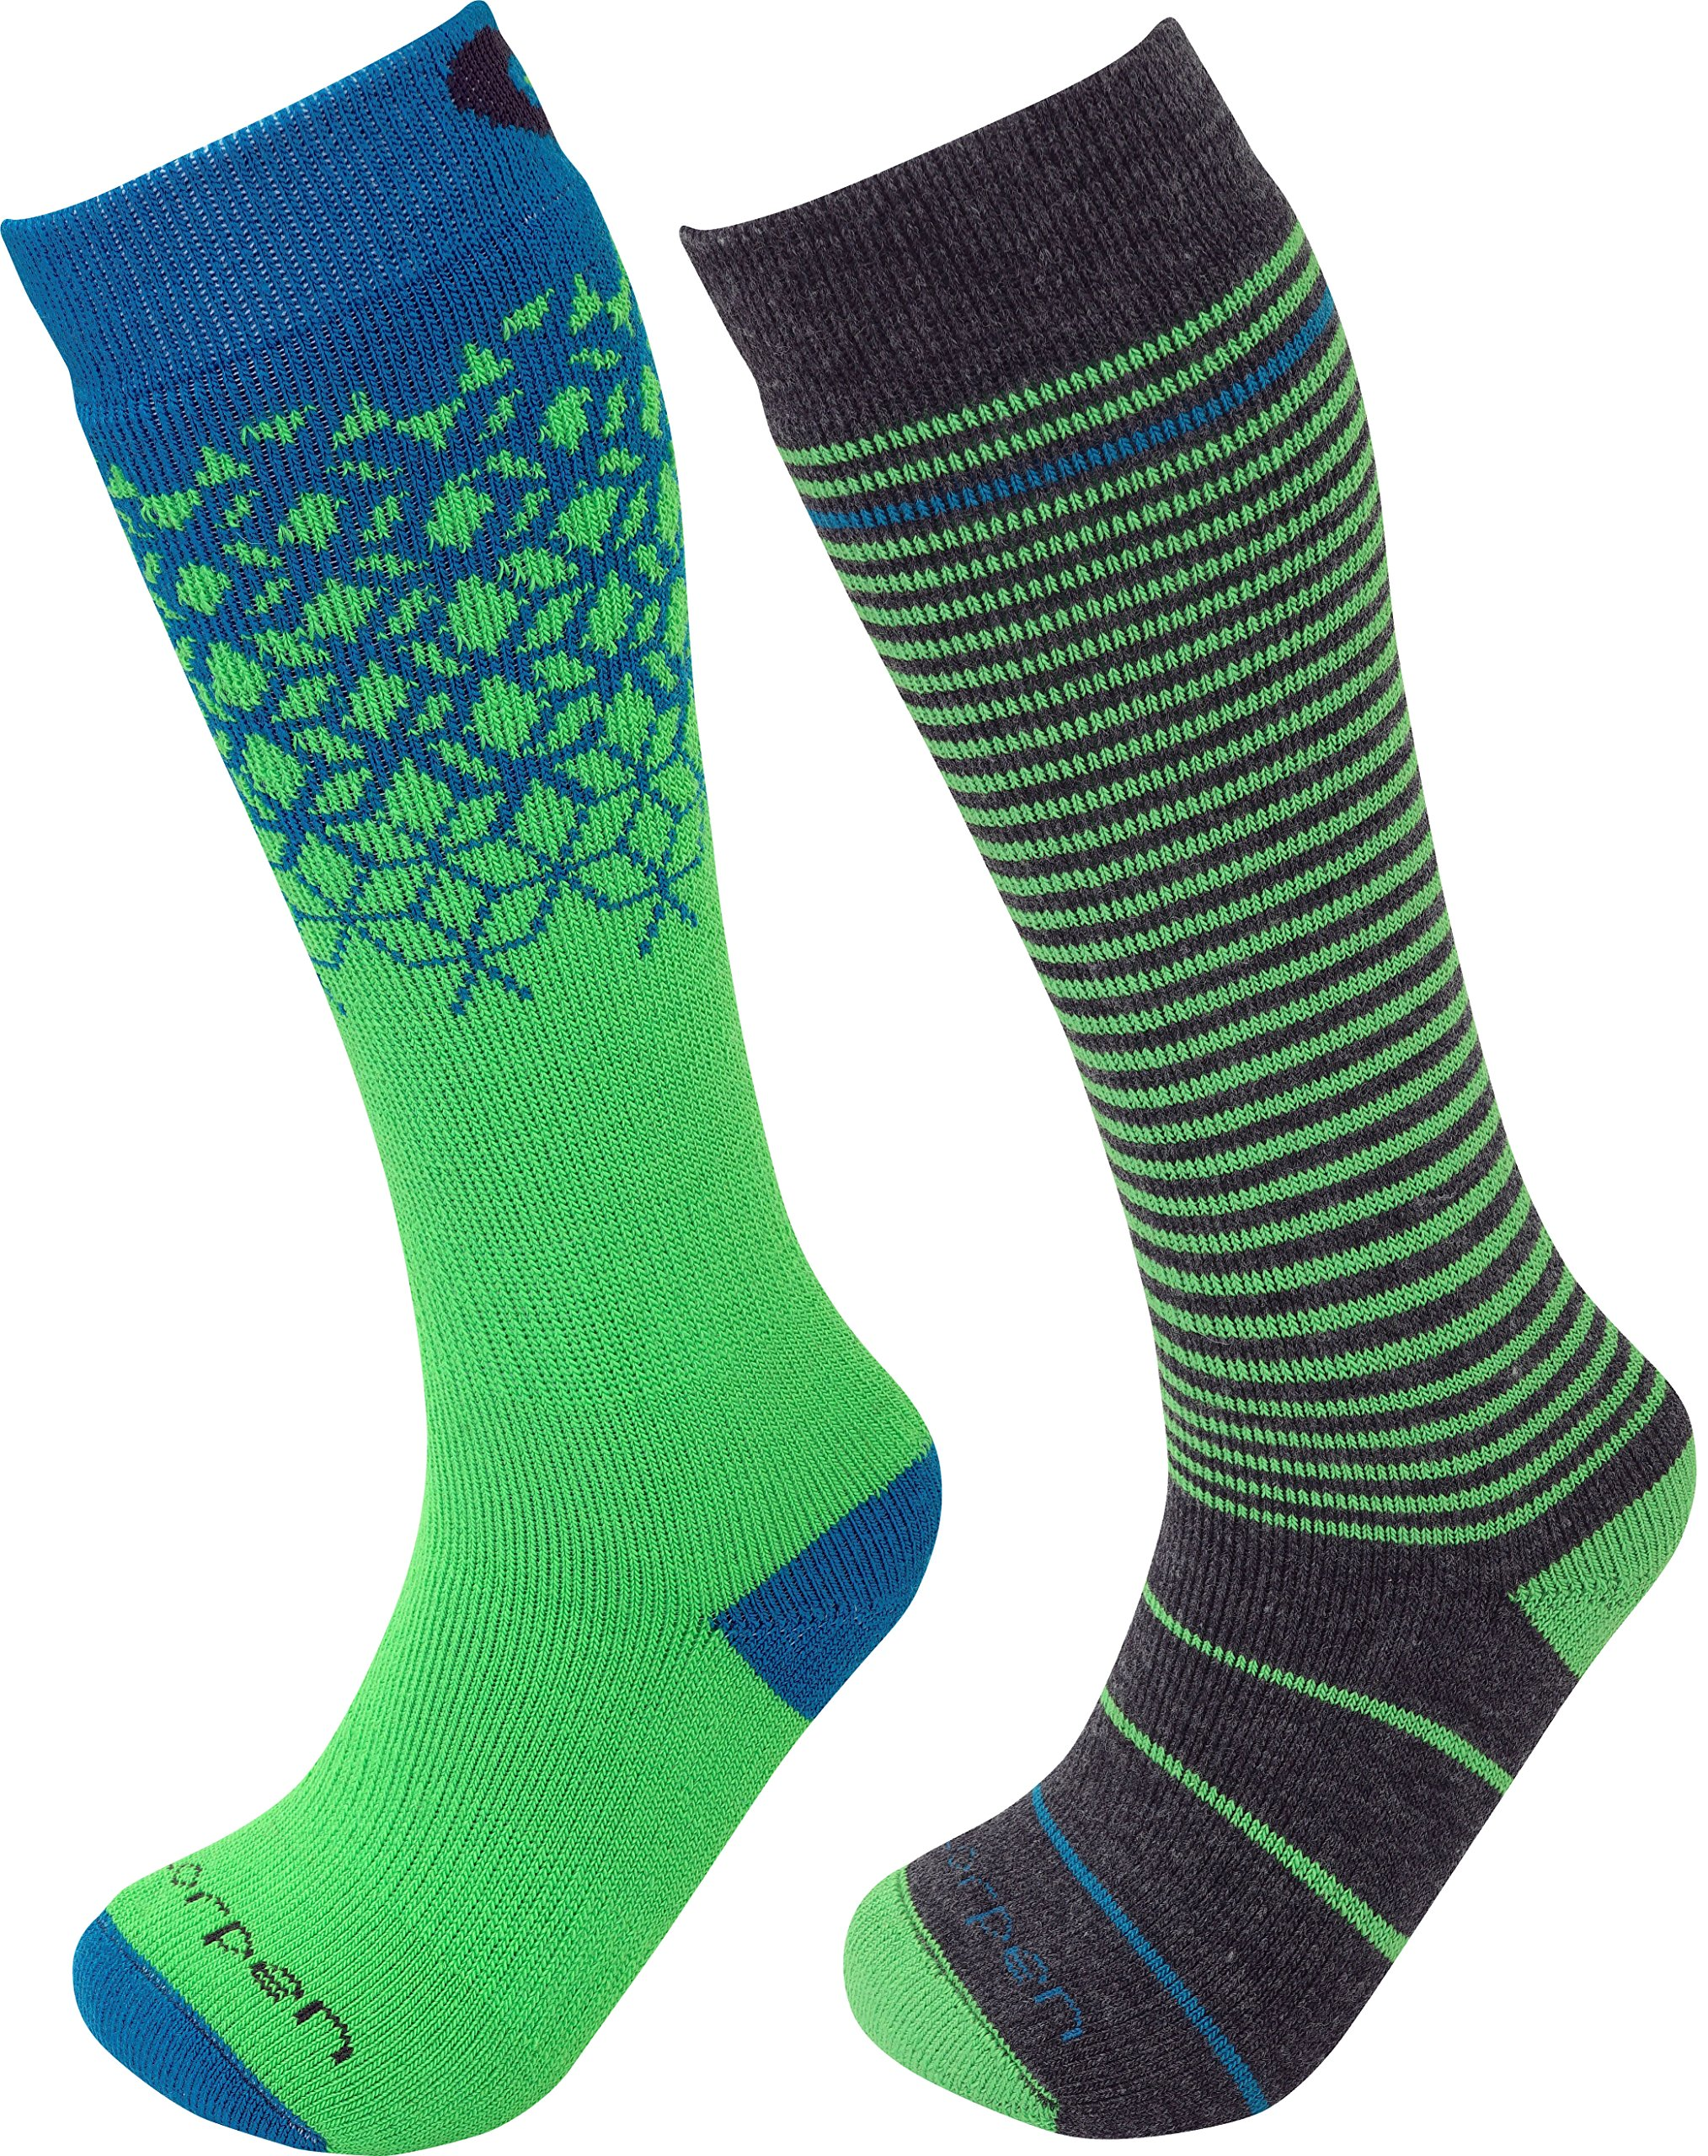 Lorpen Unisex Youth T2 Kids Merino Ski Socks-2 Pack, Green, X-Small by Lorpen